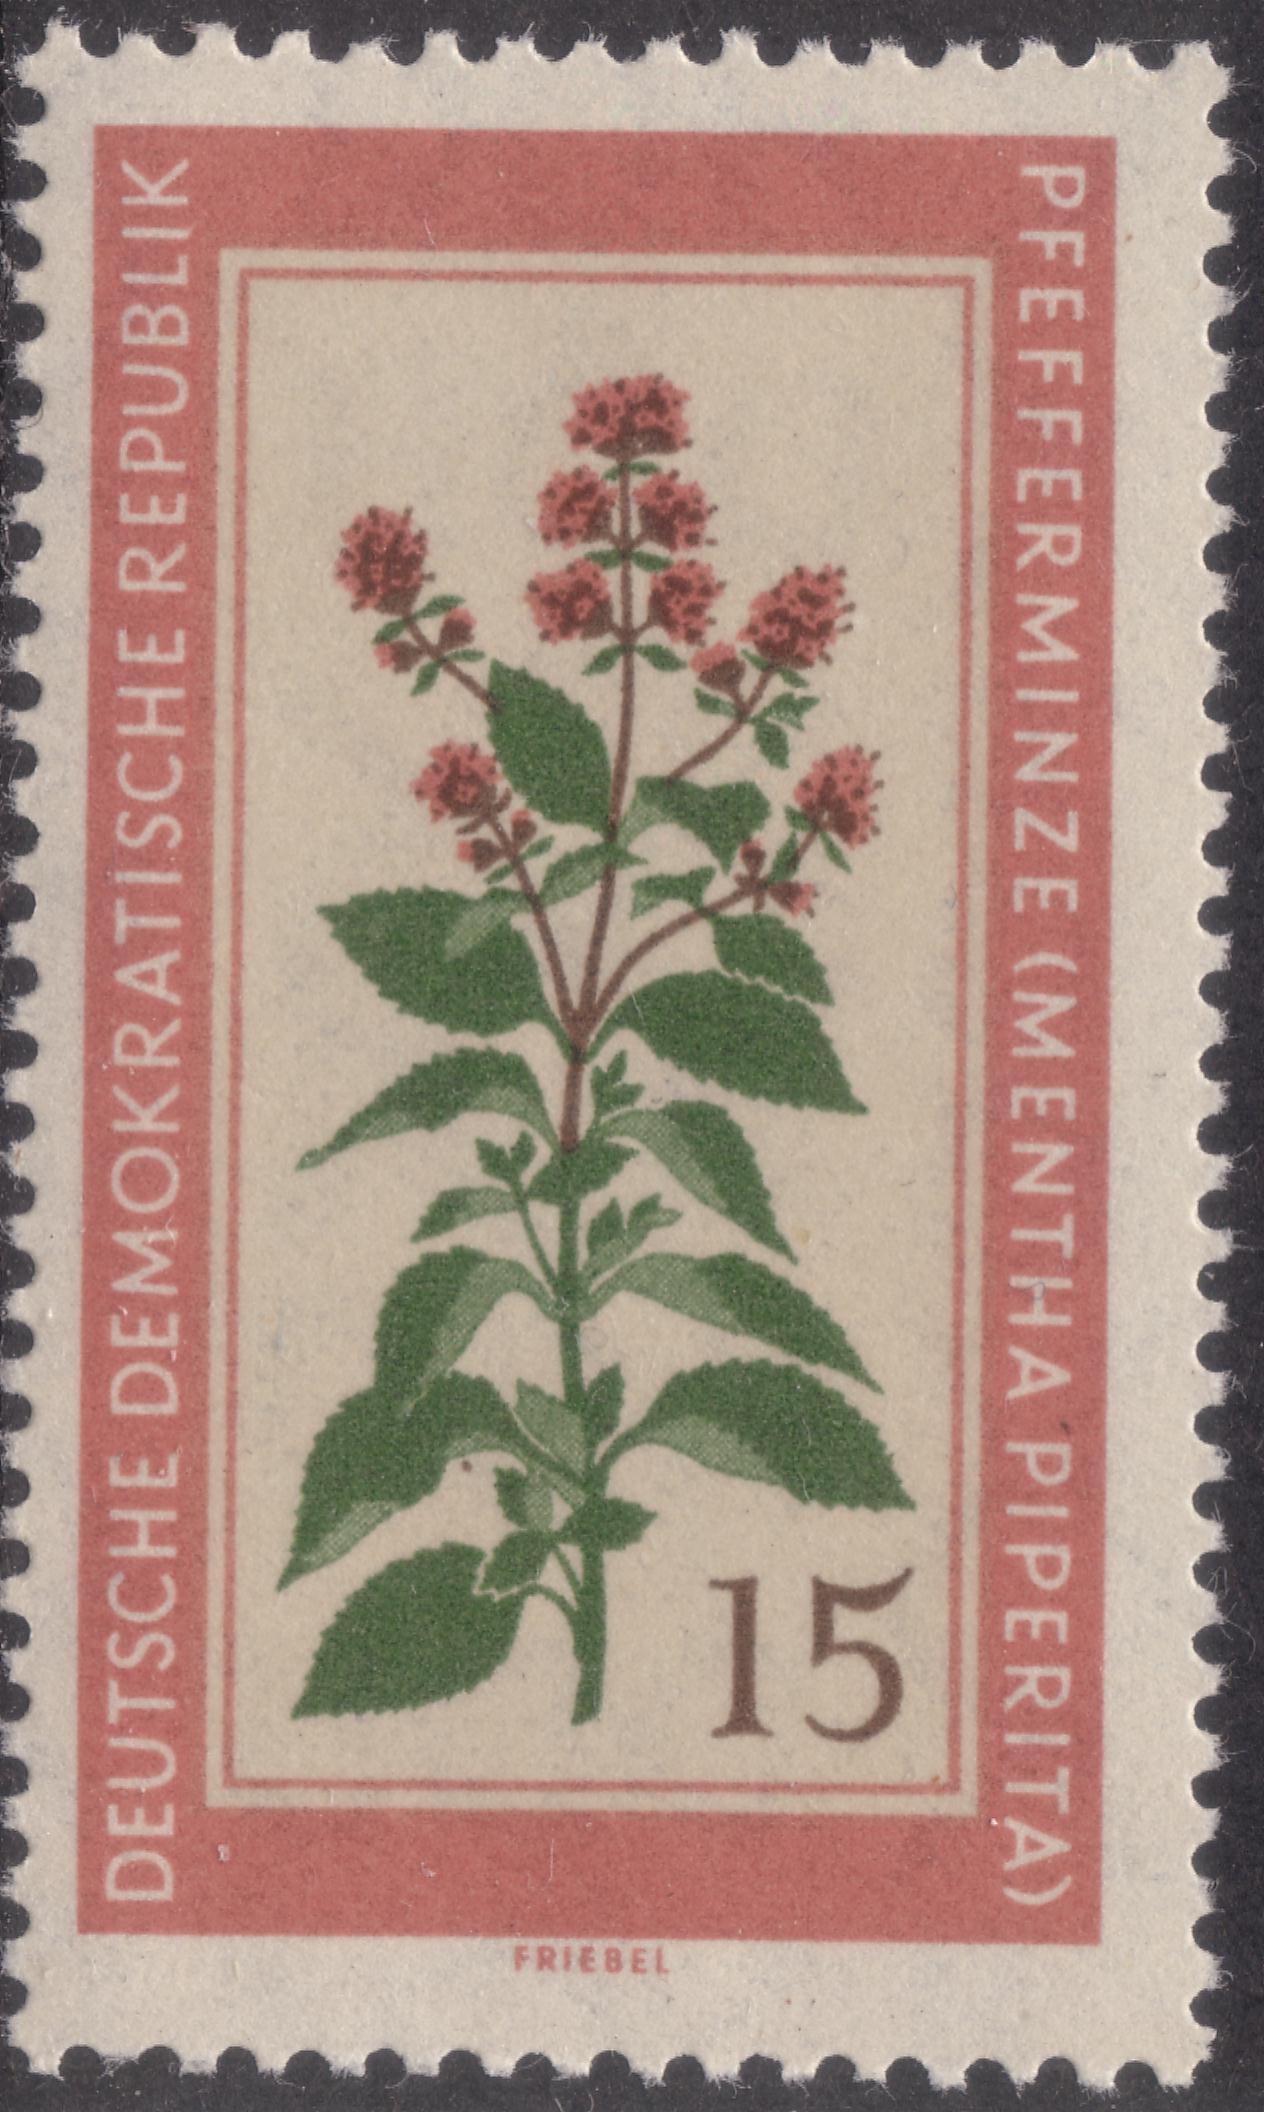 Image of Mentha